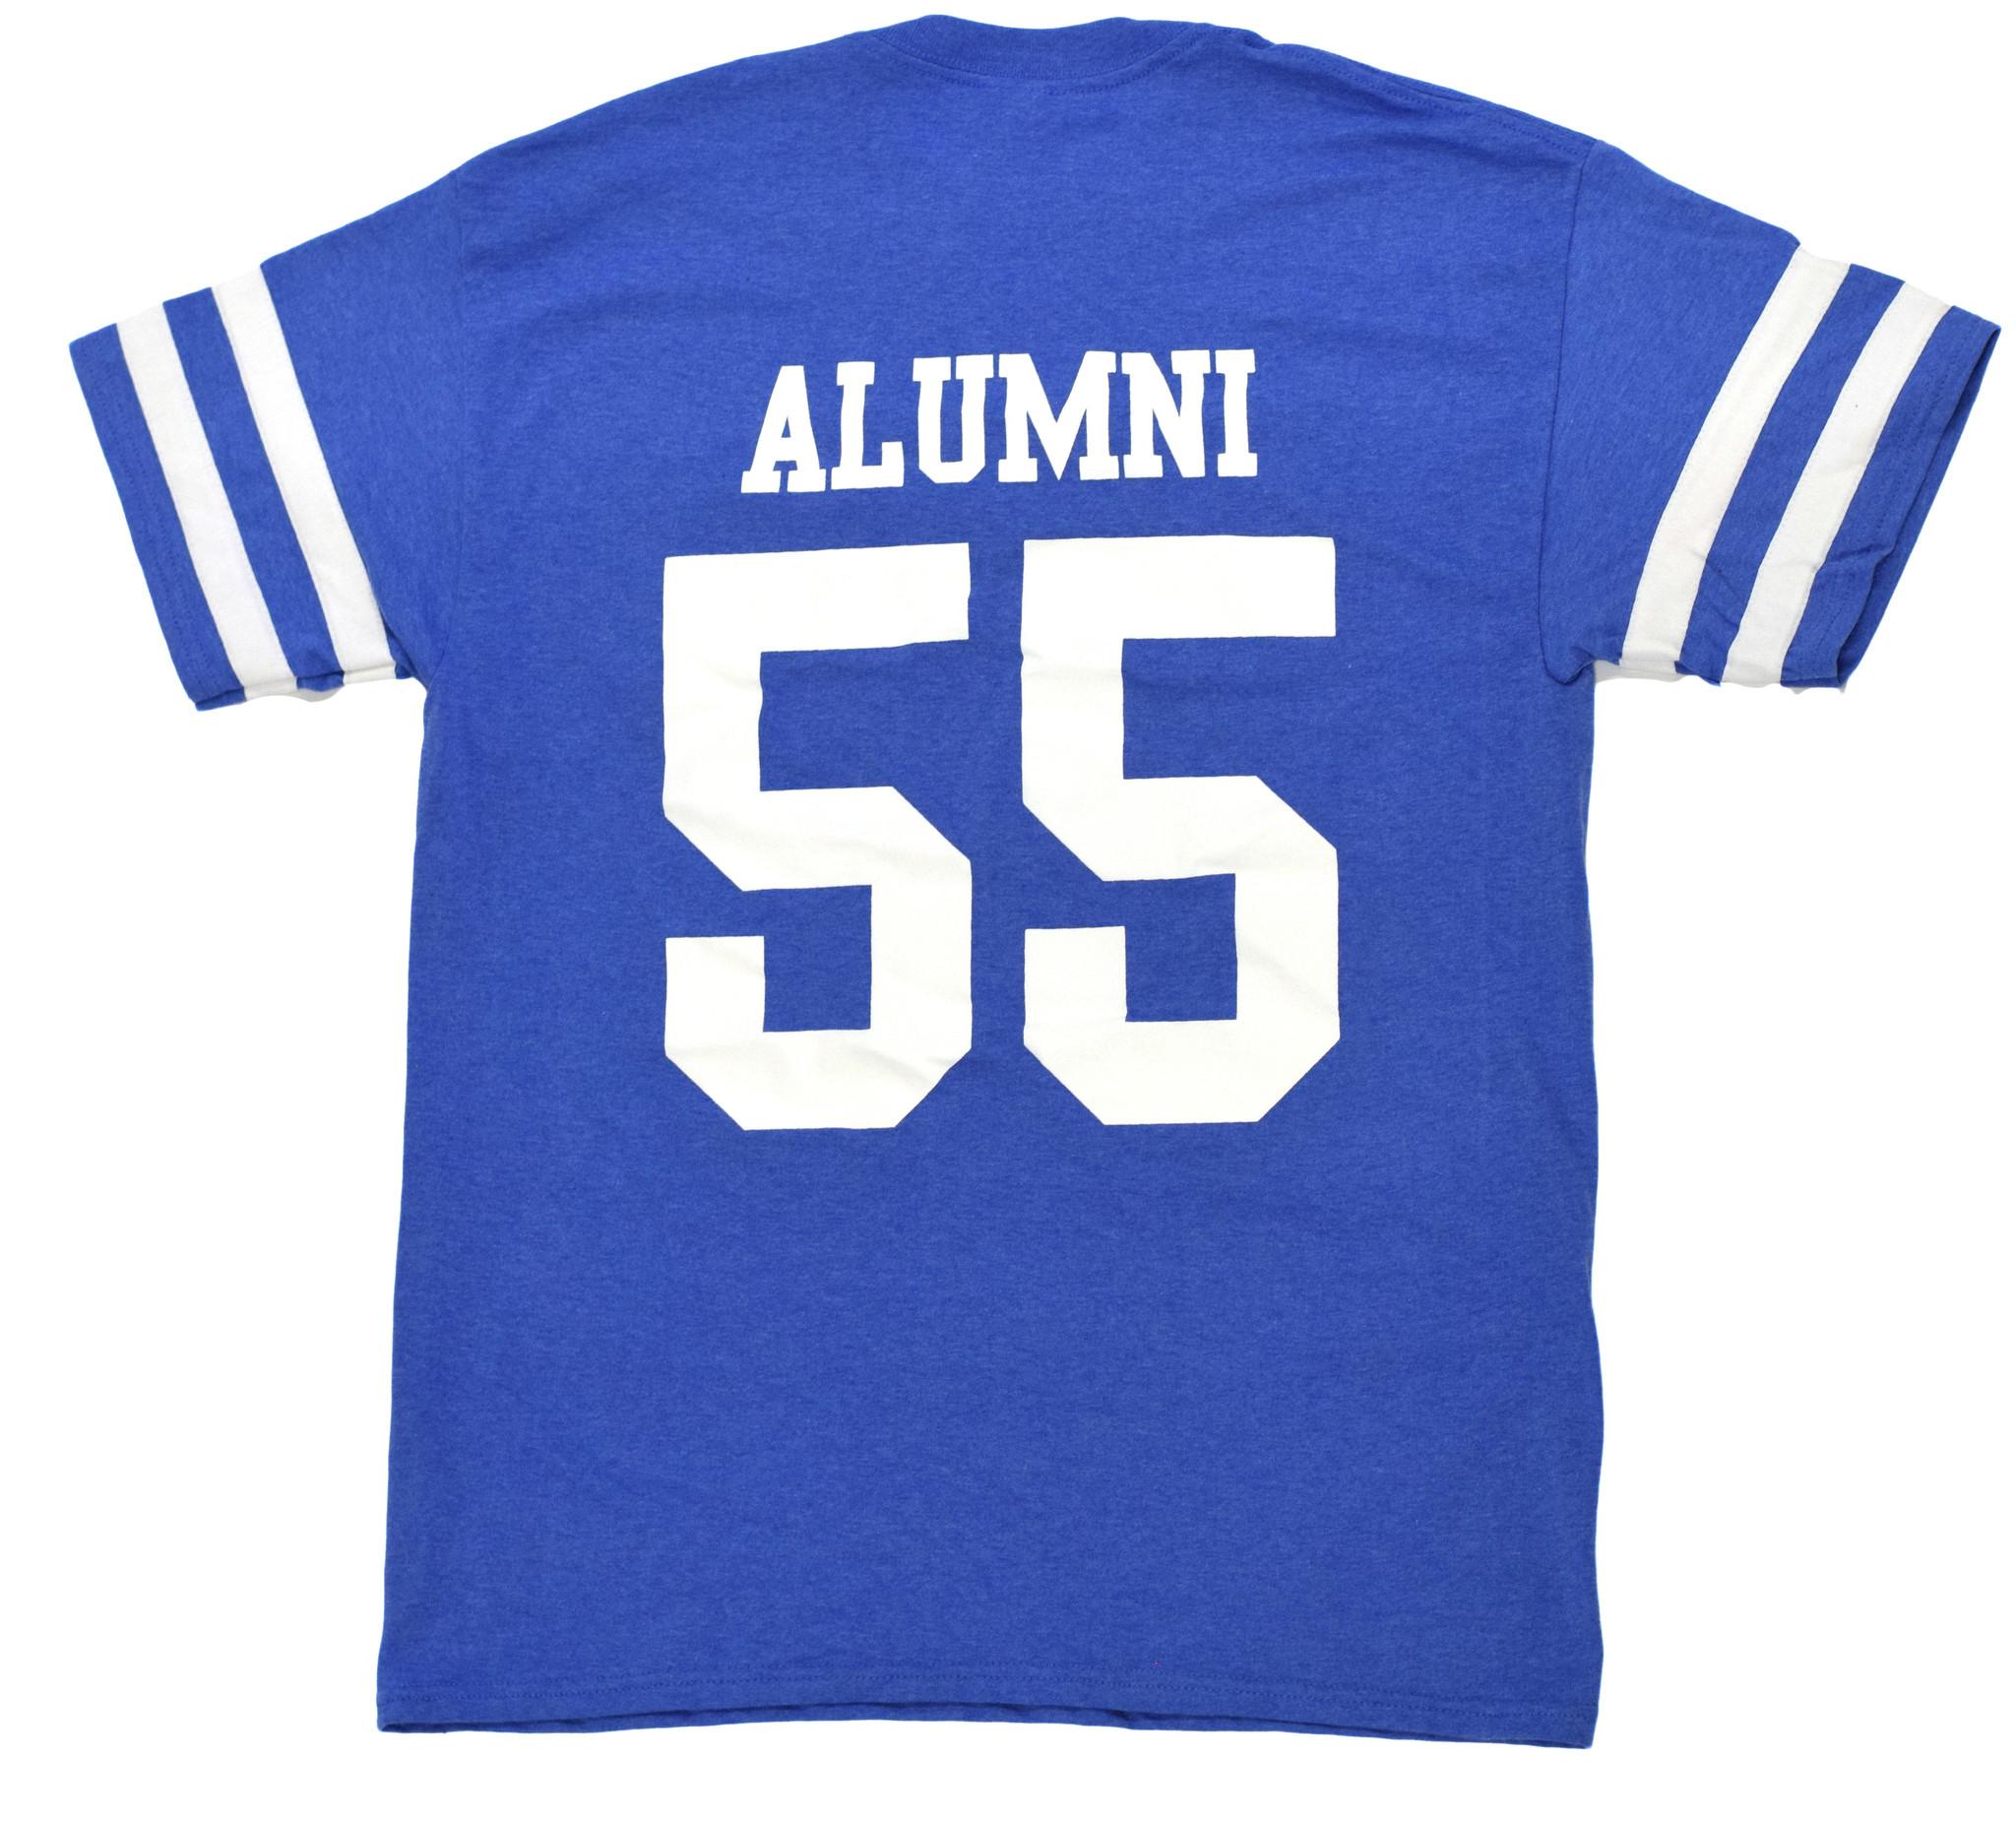 Alumni T-Shirt-3